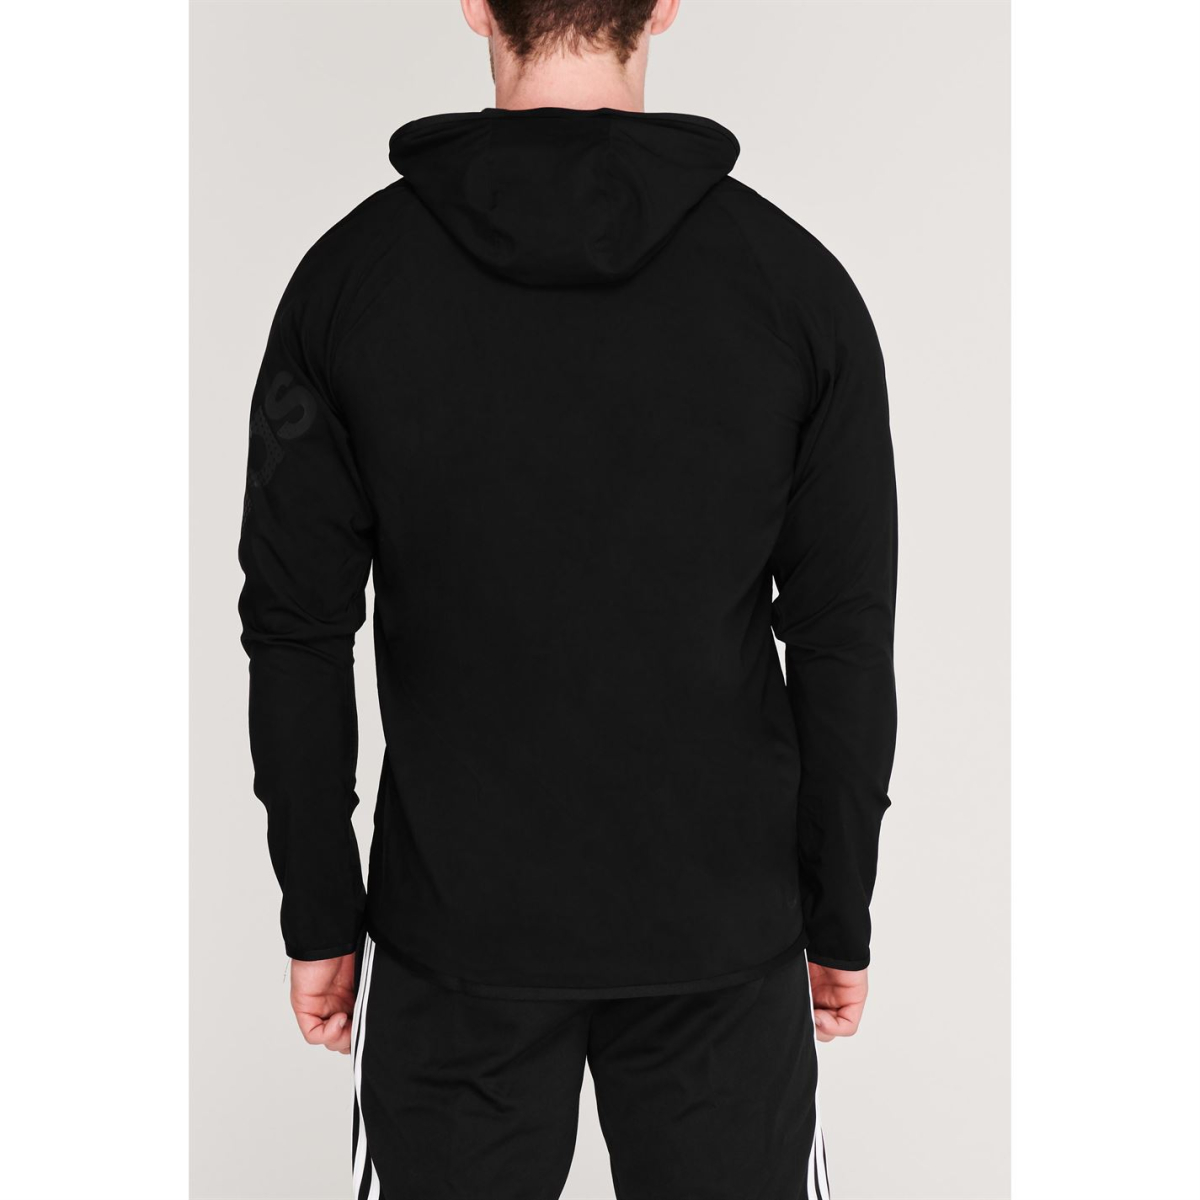 Wu Tang Herren Kapuzenjacke Kapuzenpullover Jacke Pullover Sweatshirt 9105